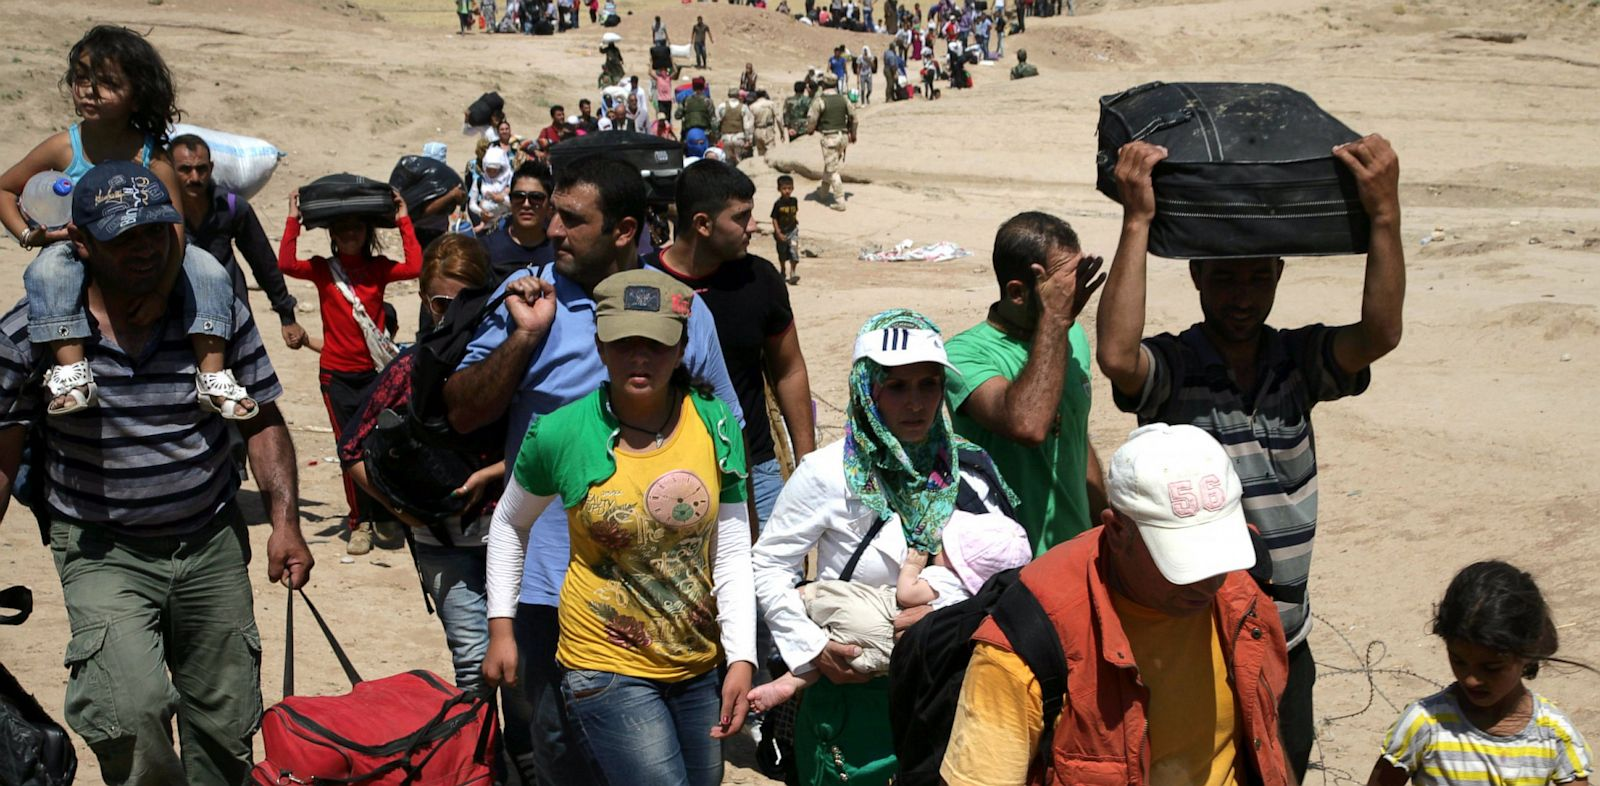 PHOTO: Syrian refugees cross the border into the autonomous Kurdish region of northern Iraq, on August 17, 2013.